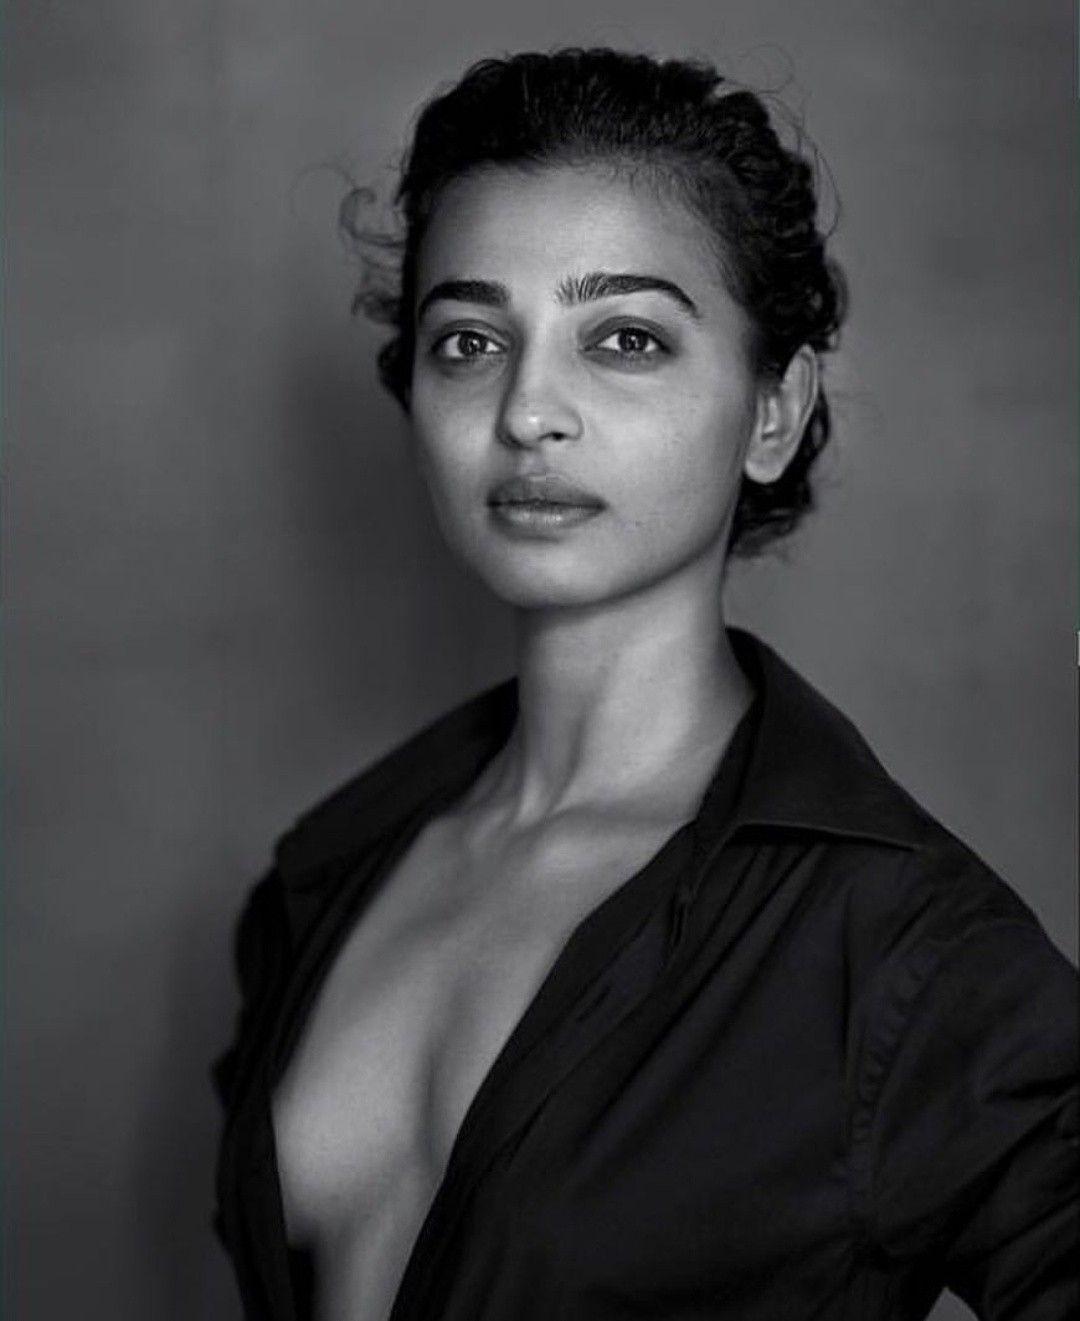 Pin By Virendra Gupta On Black & White